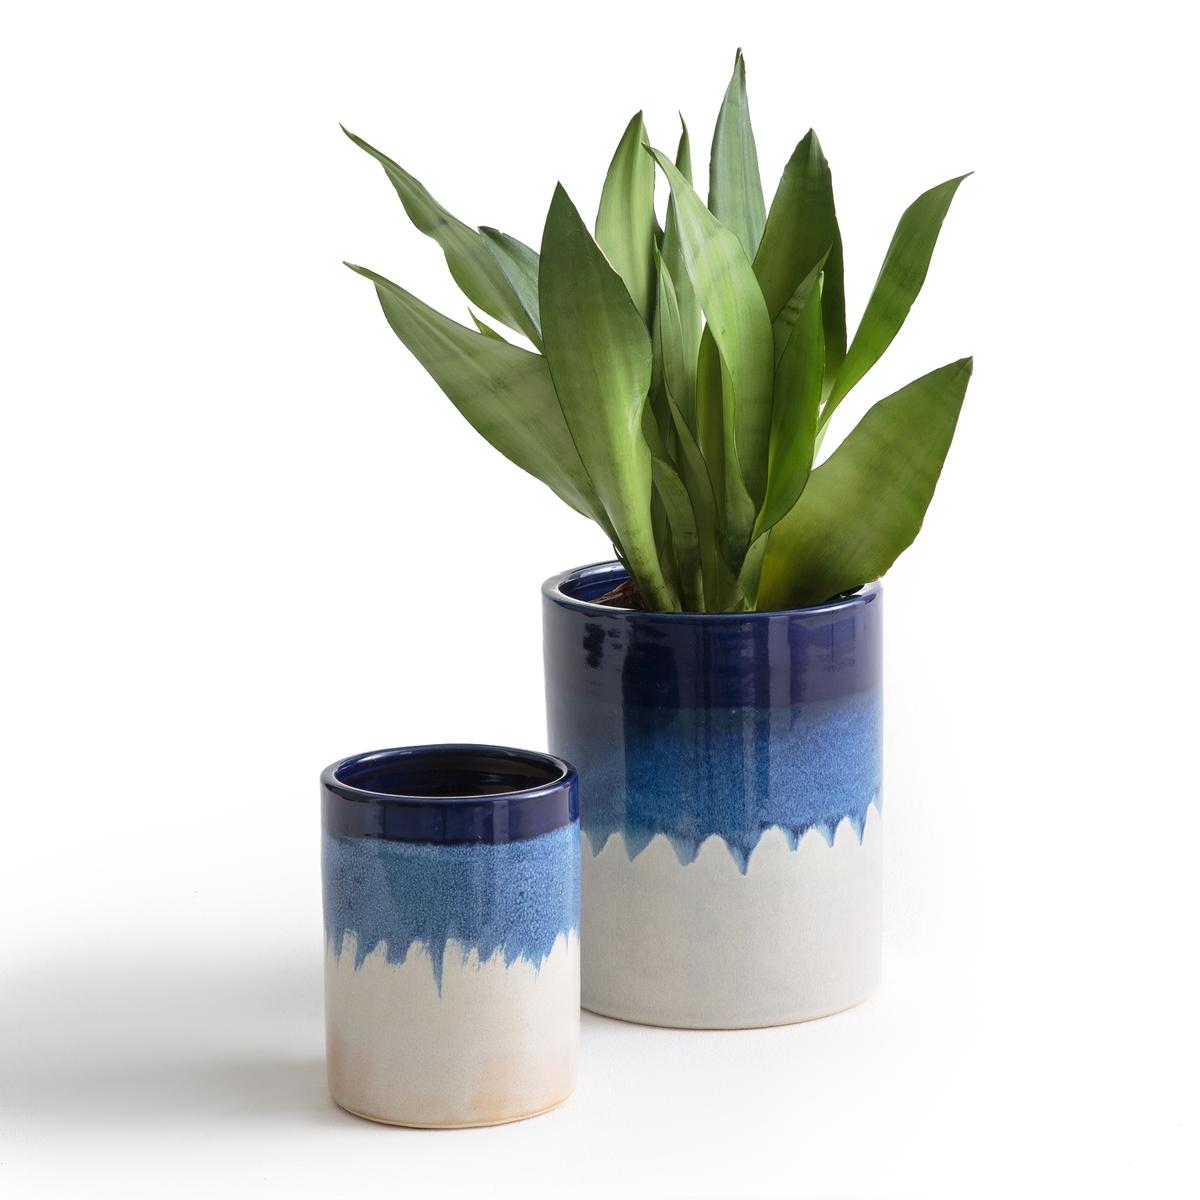 Fioriera ceramica tie & dye Tapiwa (conf. da 2)